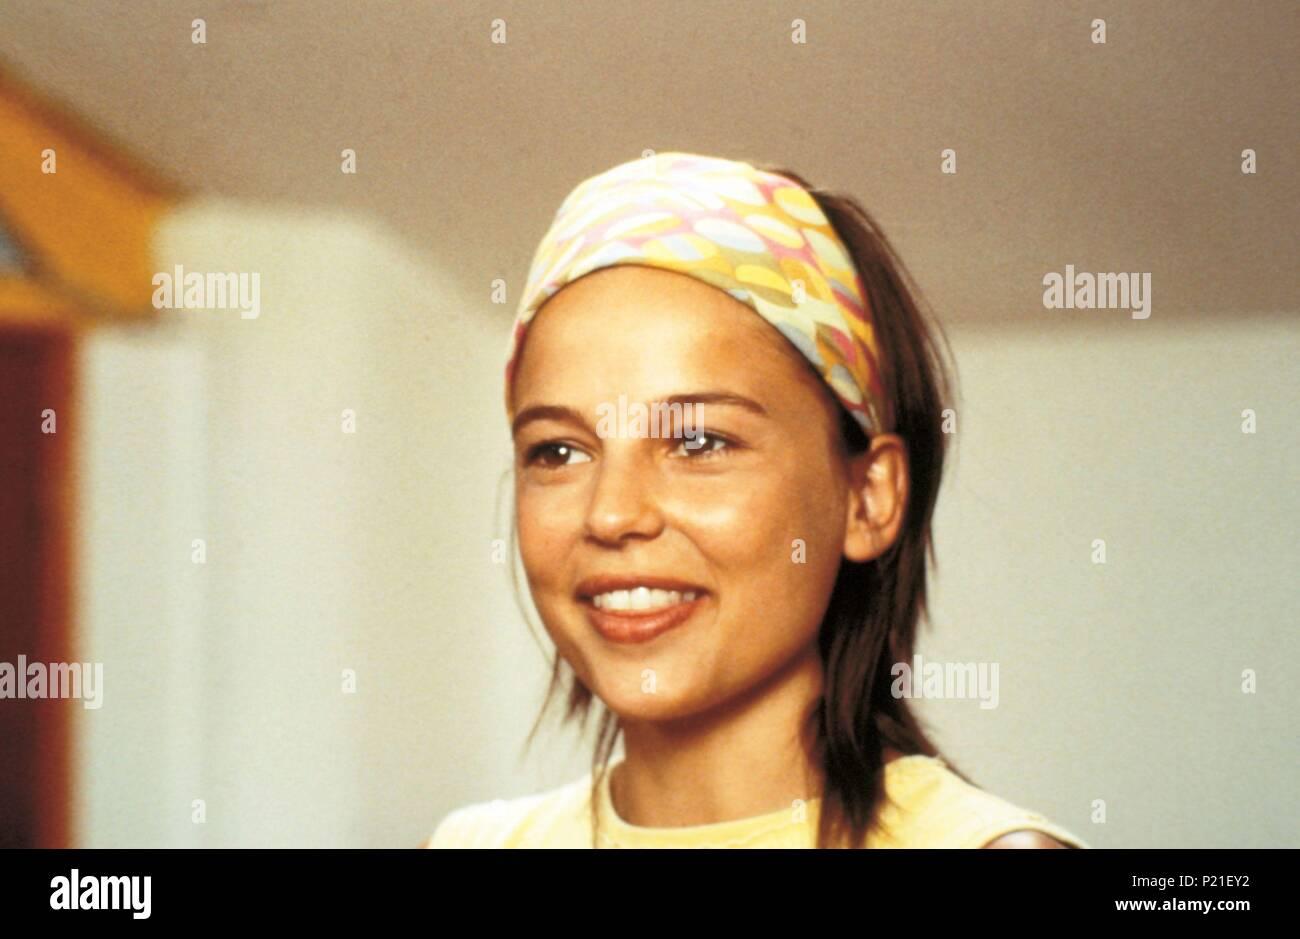 picture Elena Anaya Rencor - ES 2002 [topless]